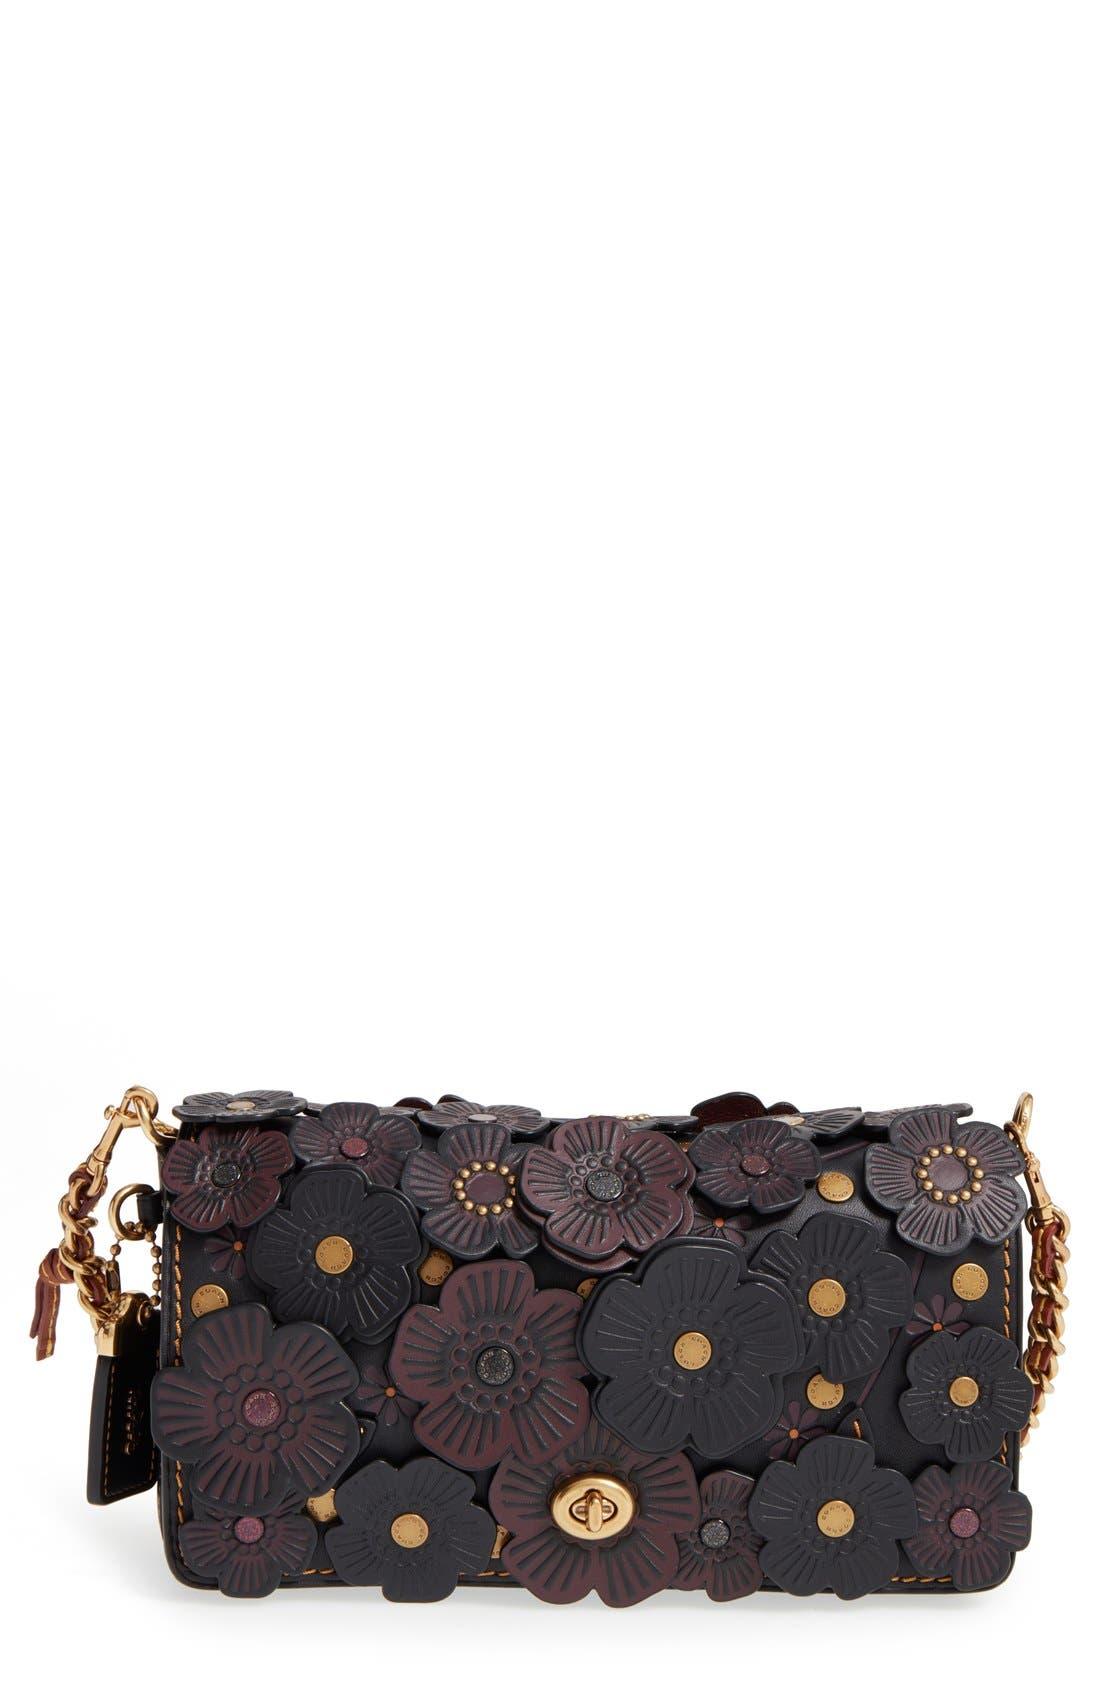 'Dinky' Flower Appliqué Leather Crossbody Bag,                             Main thumbnail 7, color,